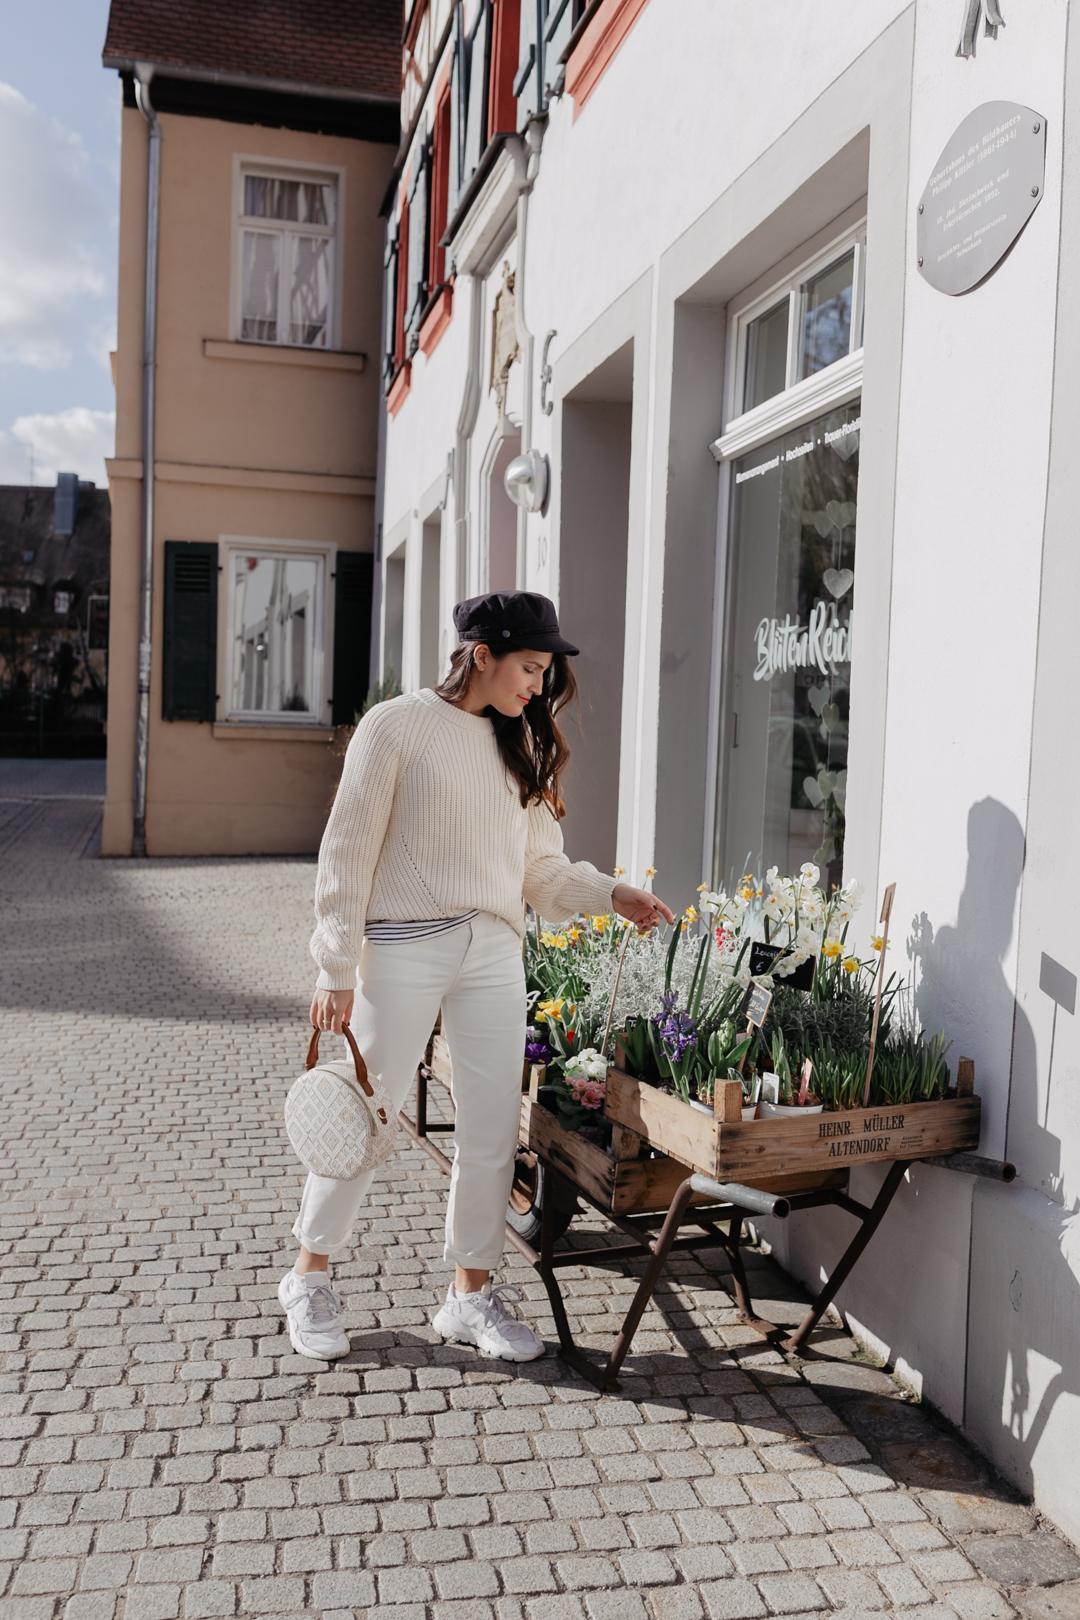 #supportyourlocal Schwabach – BlütenReich Schwabach // Pieces of Mariposa